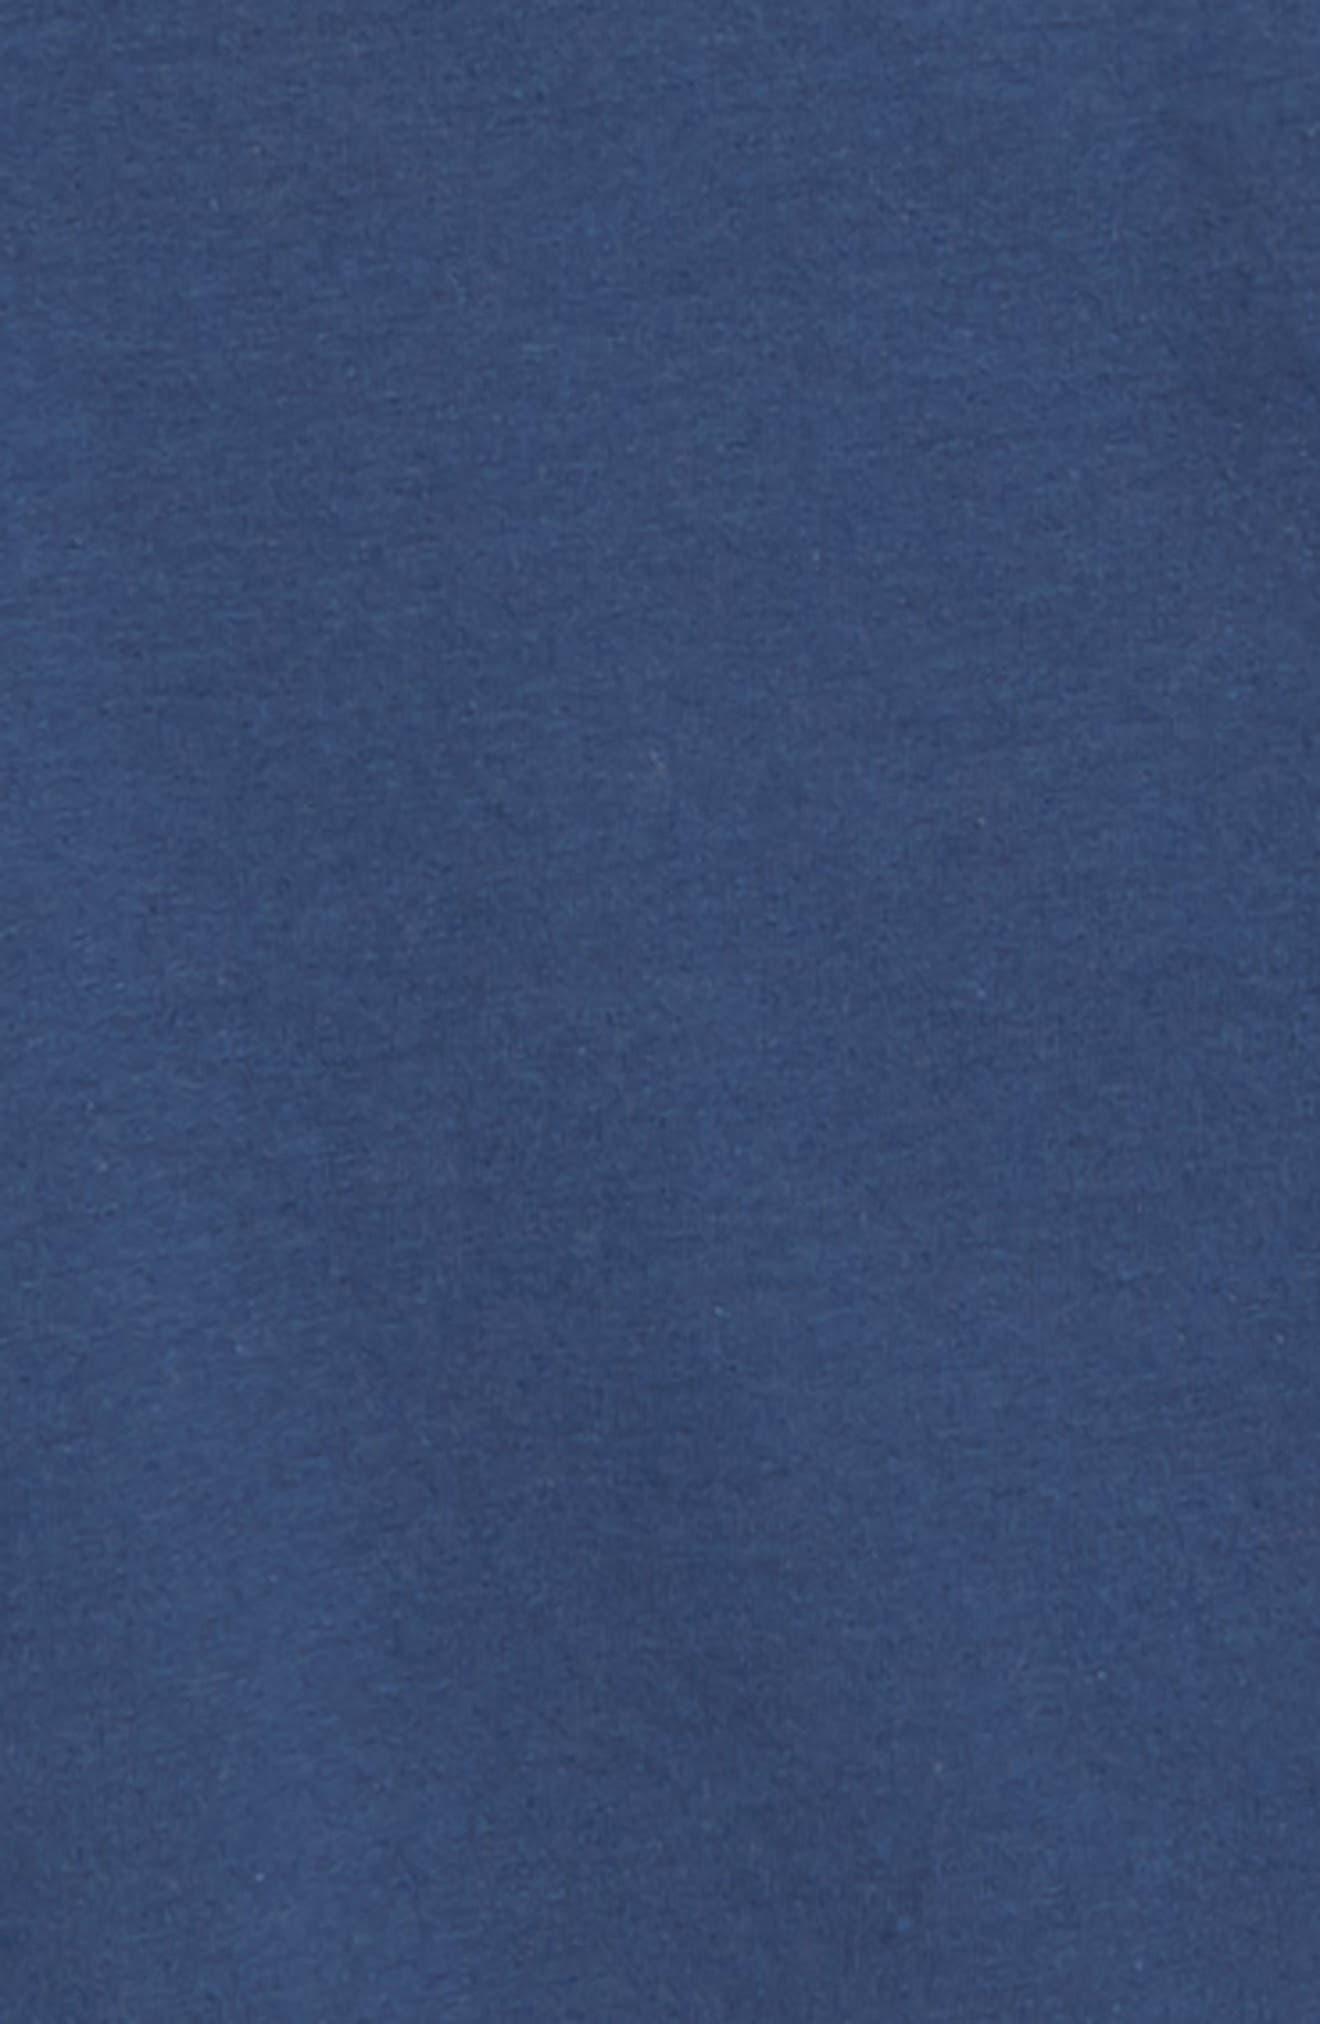 Fleece Flare Sleeve Top,                             Alternate thumbnail 2, color,                             NAVY DENIM